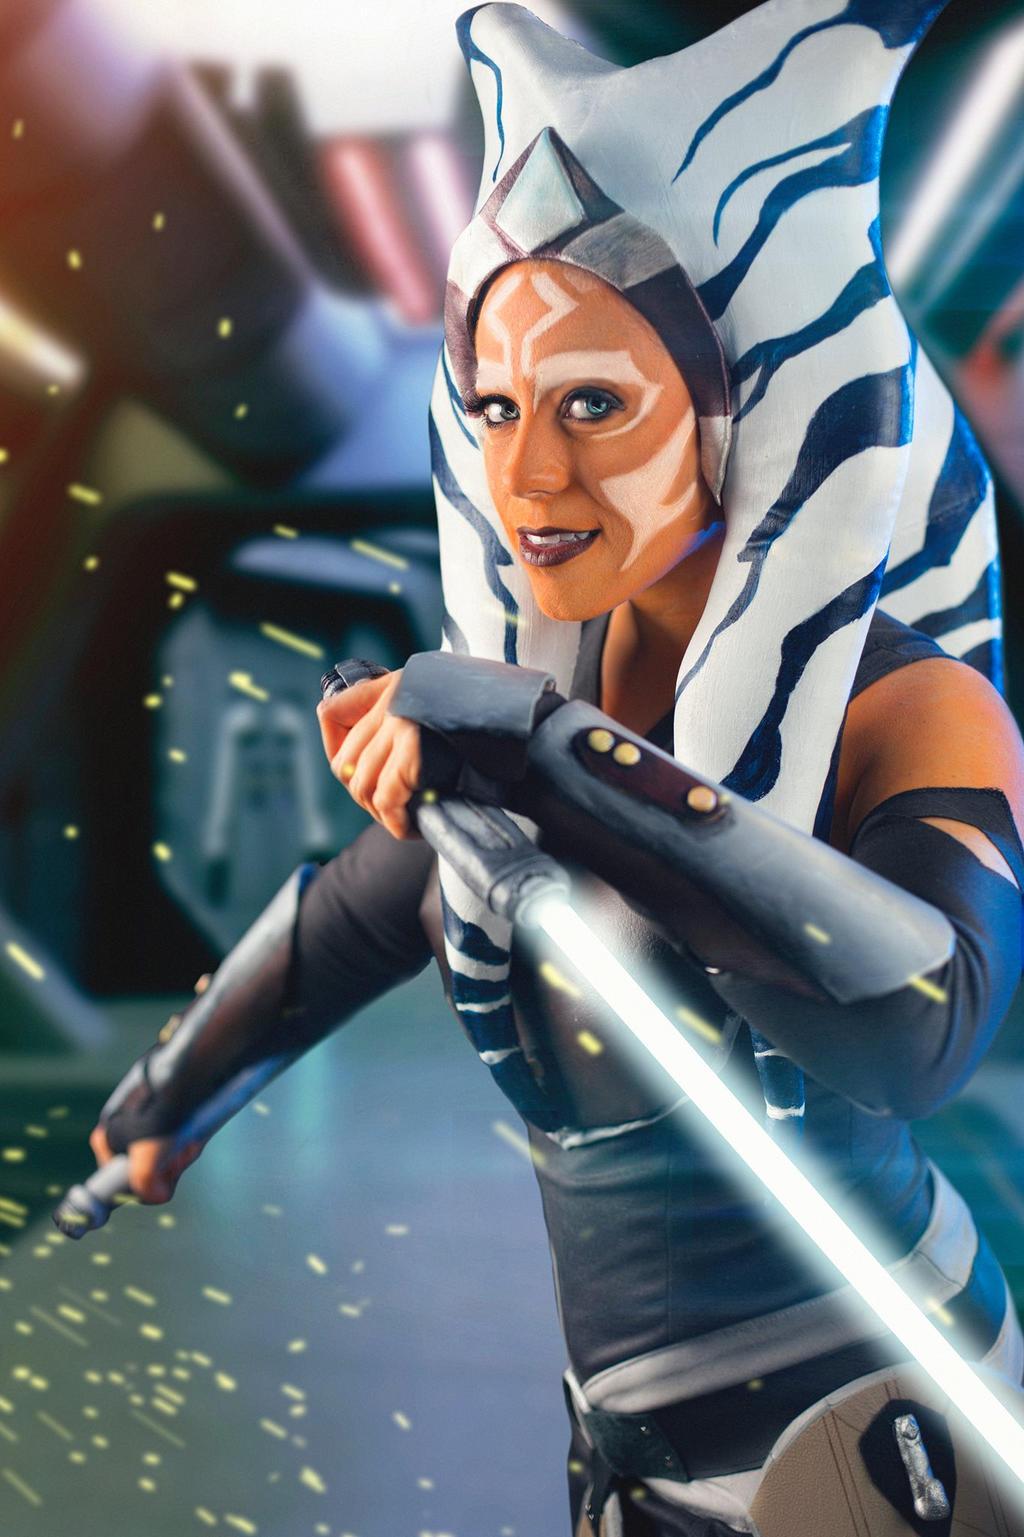 Ahsoka Tano from Star Wars Rebels cosplay by Jedimanda on